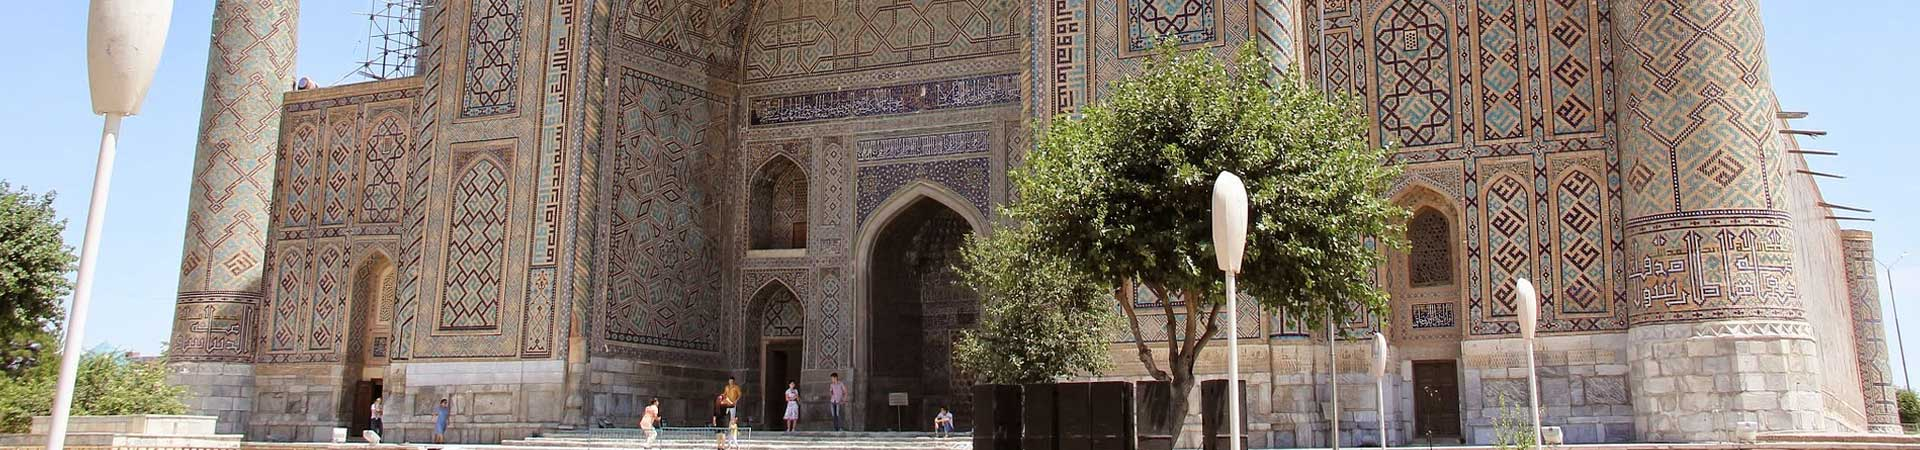 6D5N Essence of Uzbekistan